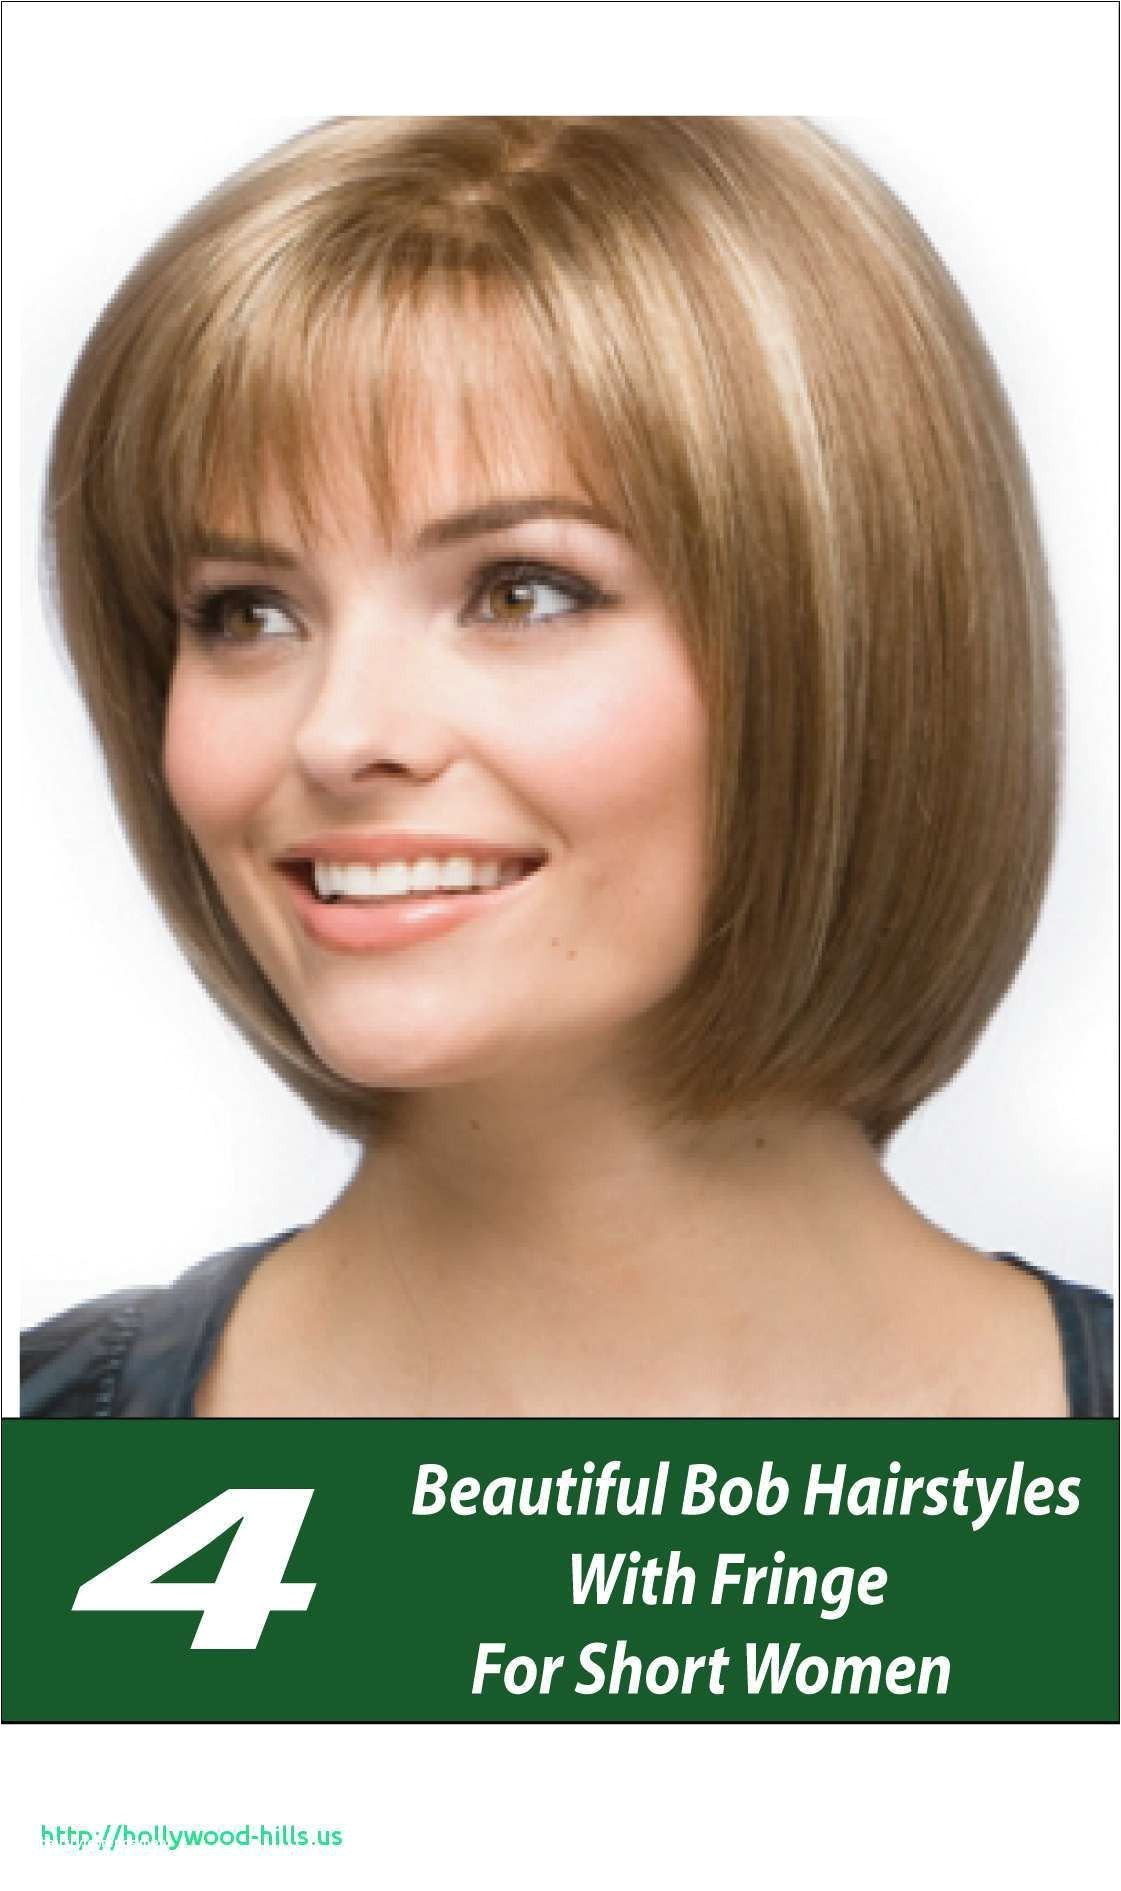 Short Bob Hairstyles with Bangs for Black Women Awesome Hairstyles with Bangs Beautiful Hairstyle for Medium Length Hair 0d